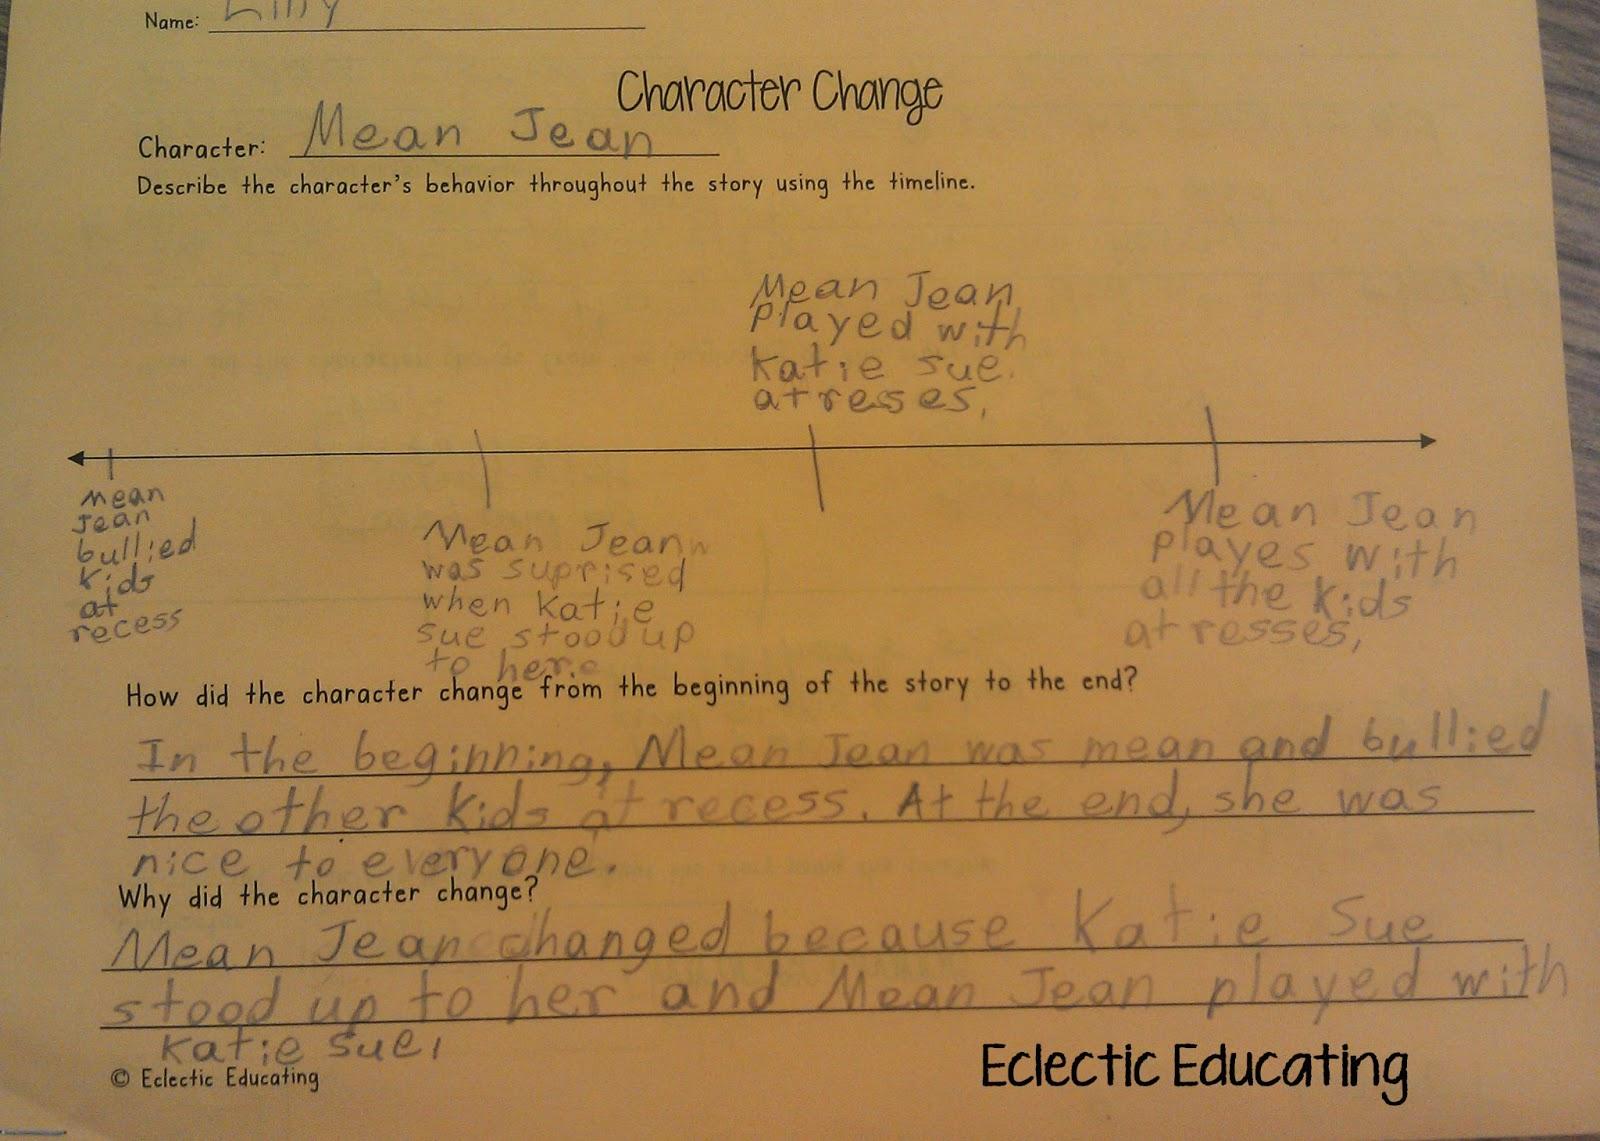 Recess 4 School Part Out